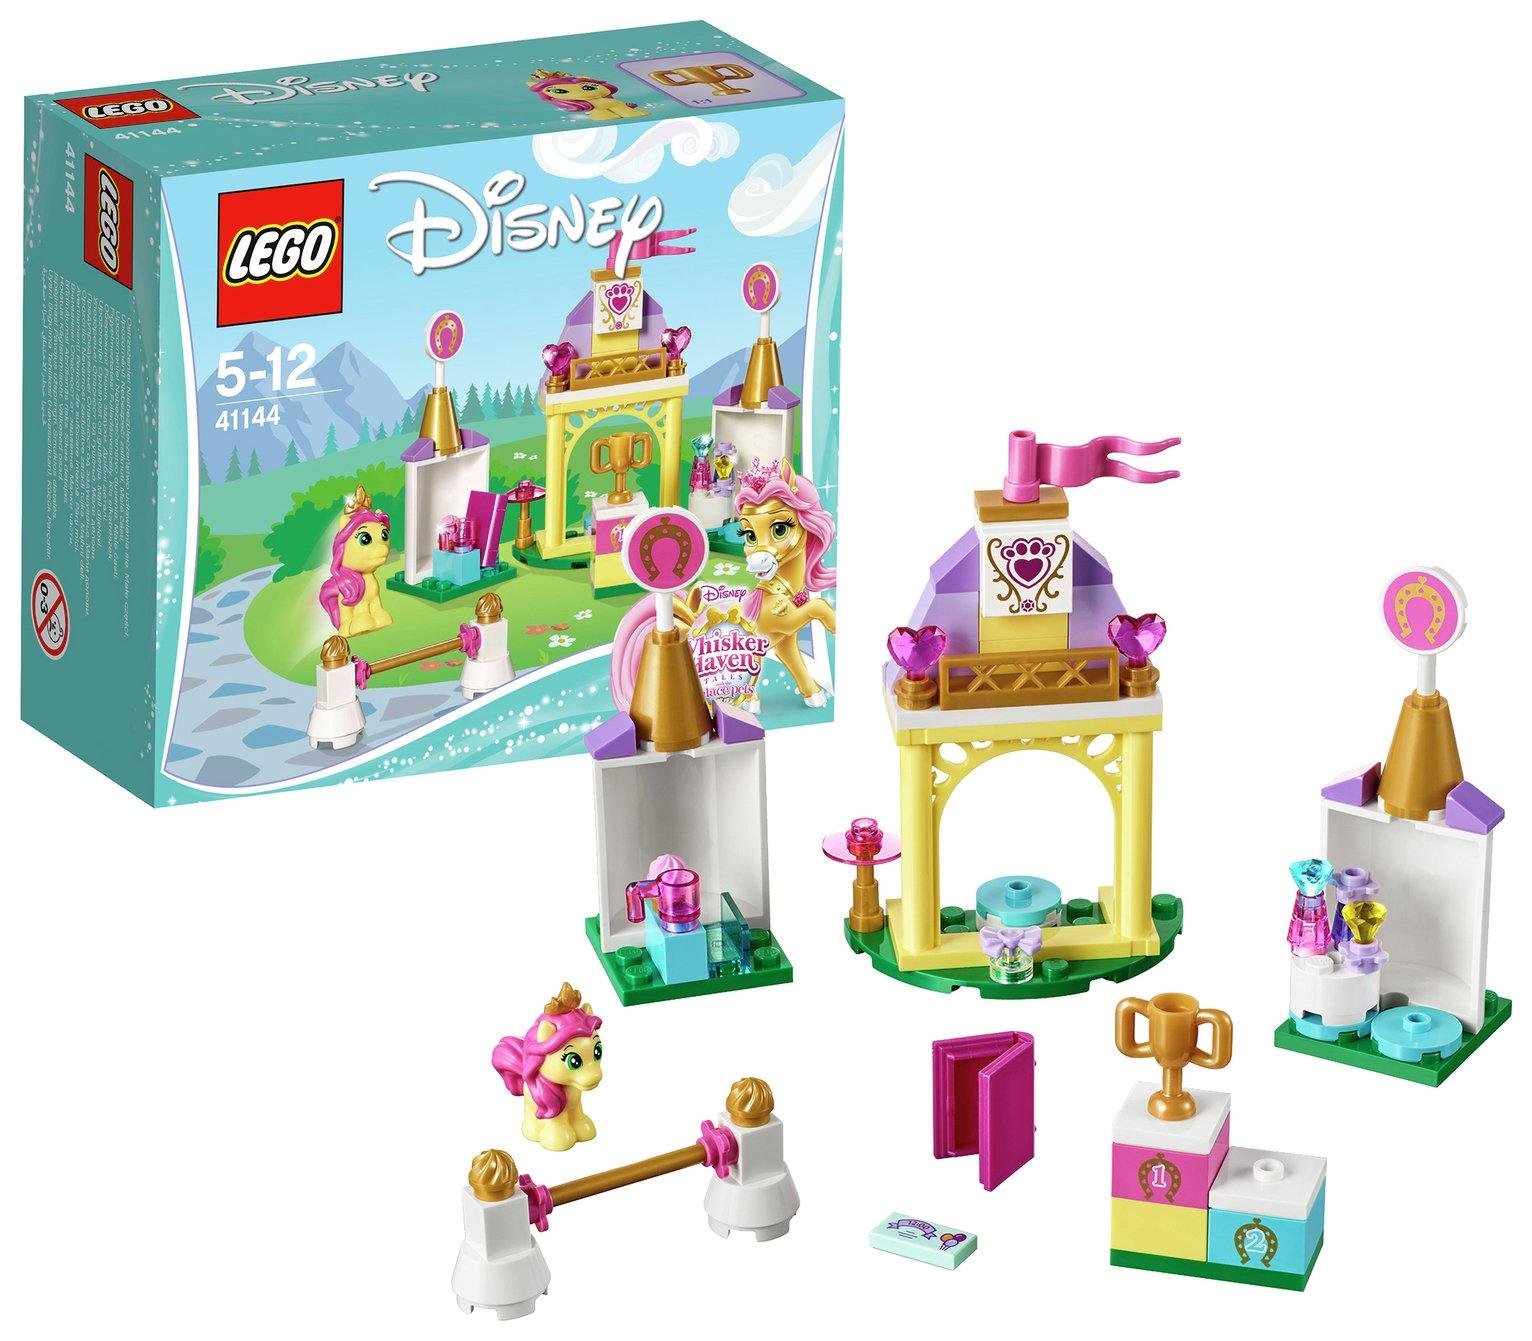 LEGO Disney Princess Petite's Royal Stable - 41144